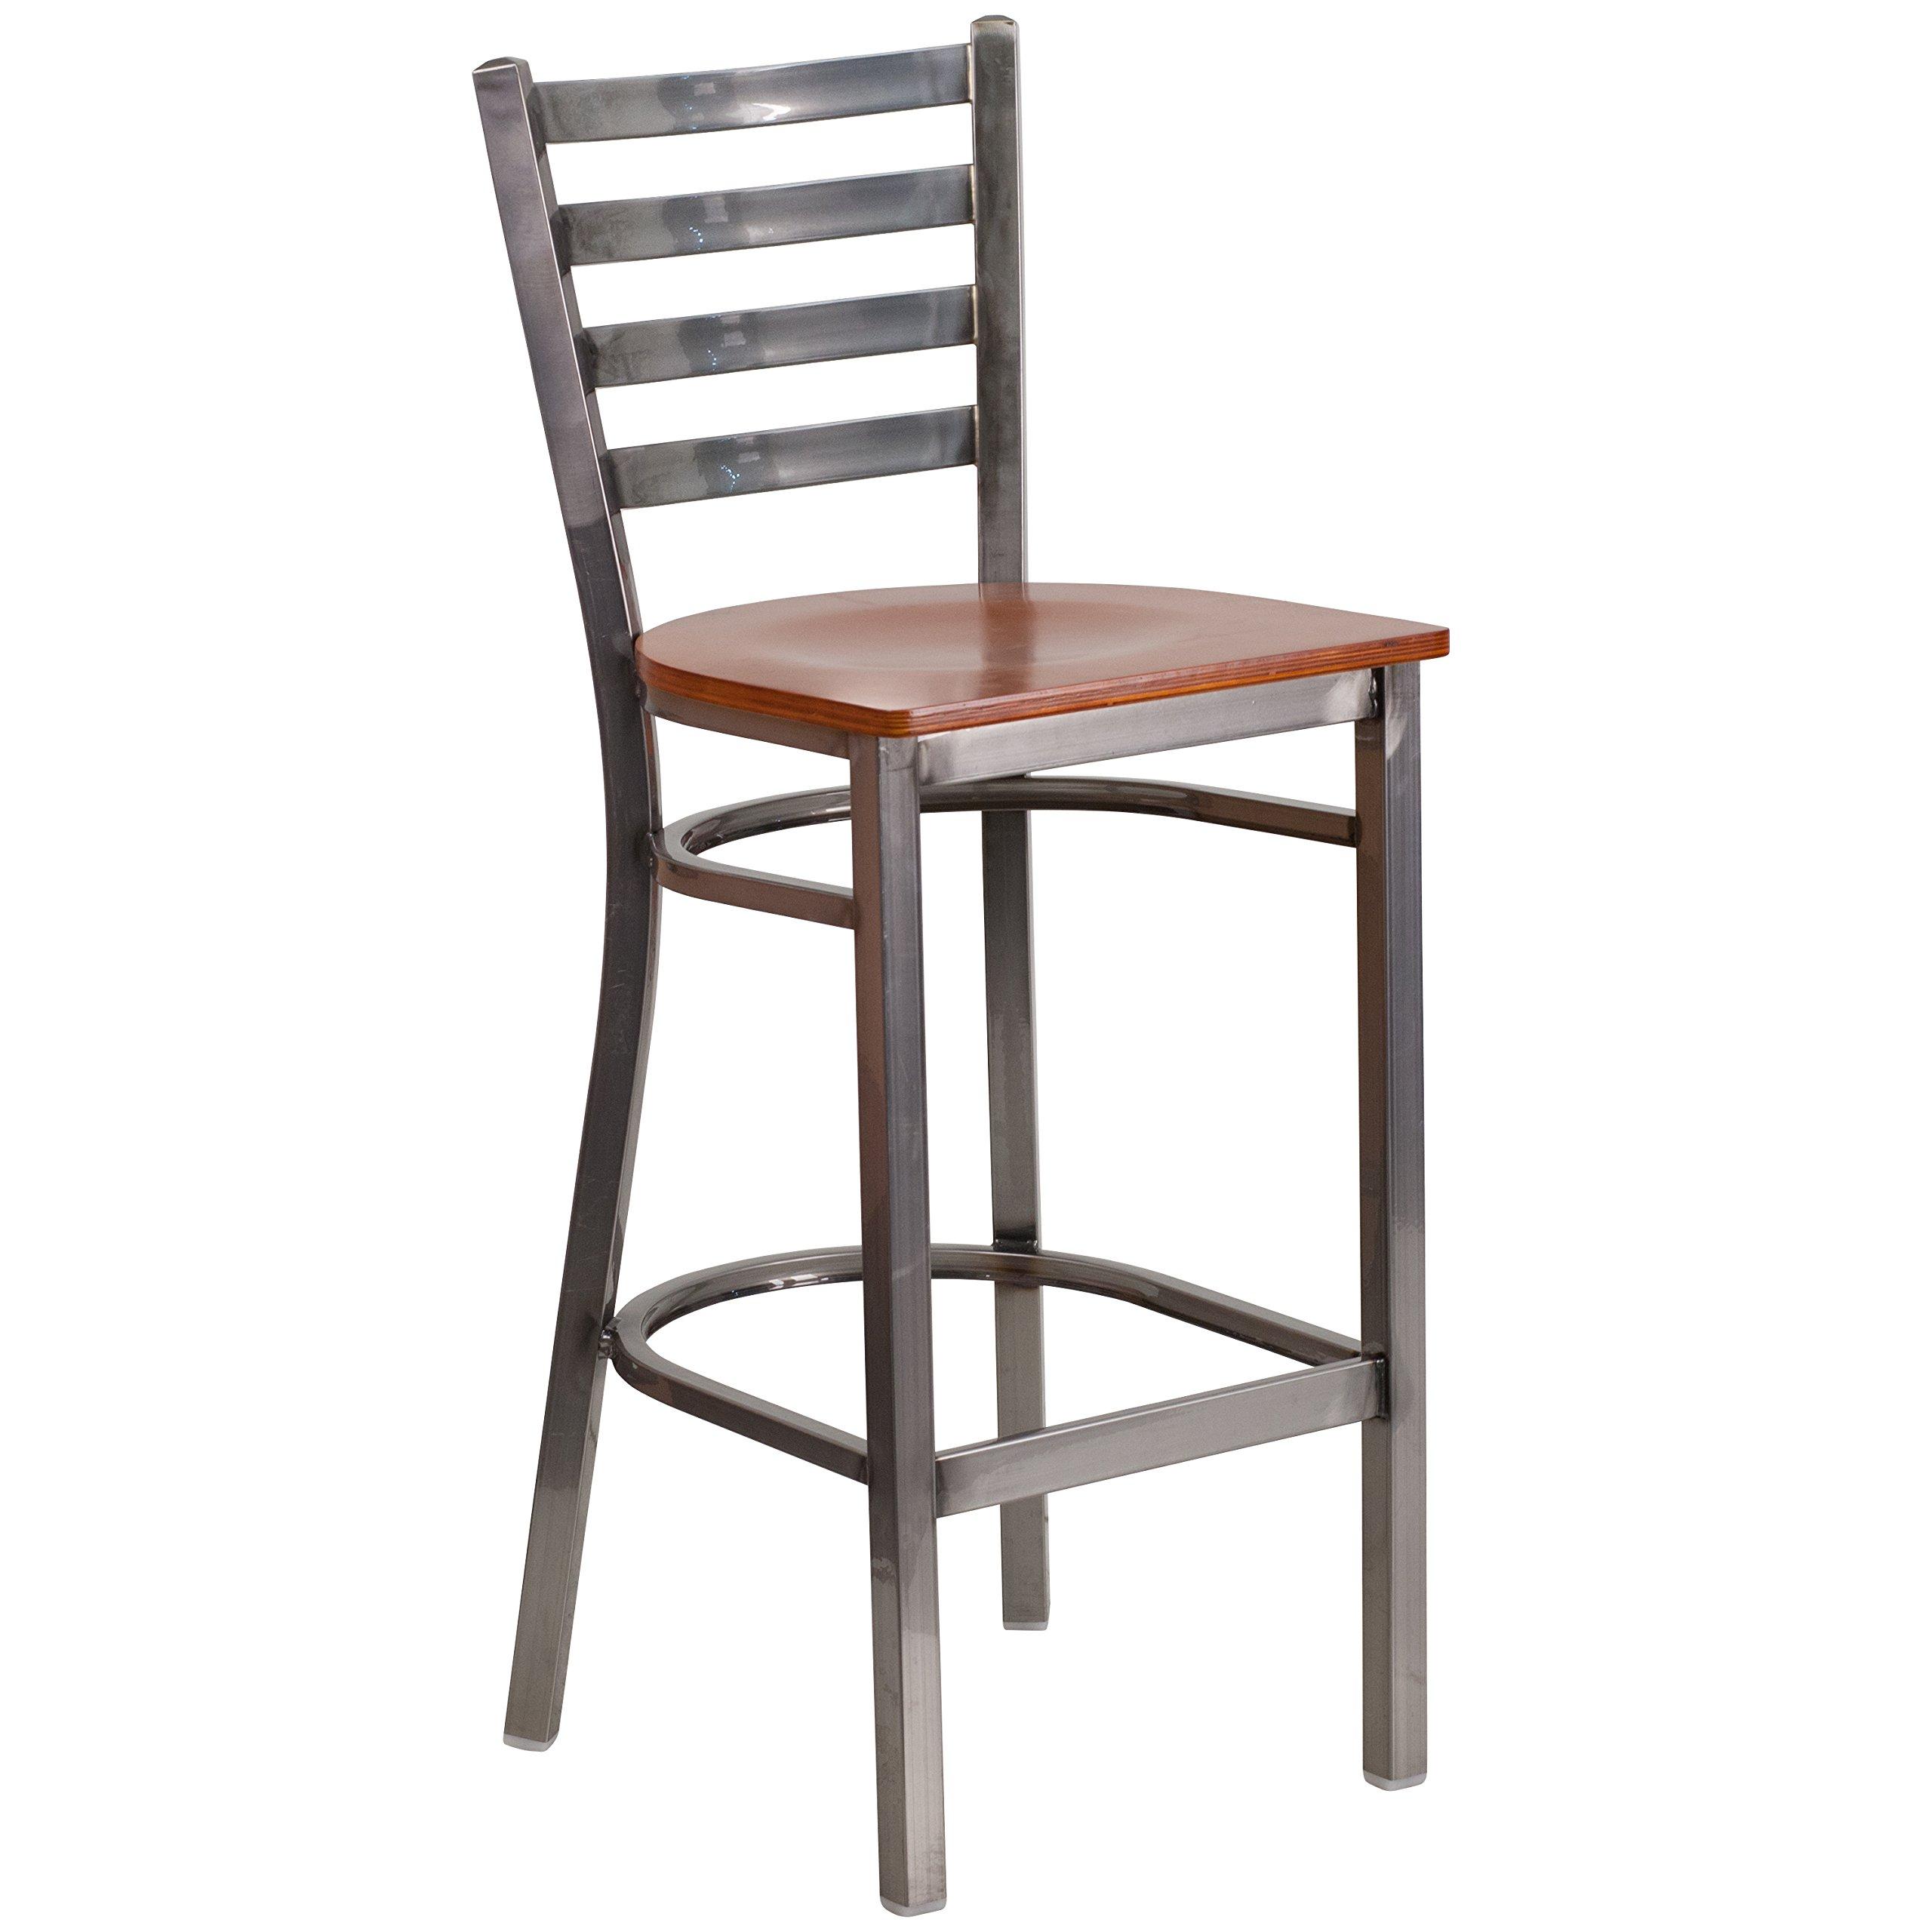 Flash Furniture HERCULES Series Clear Coated Ladder Back Metal Restaurant Barstool - Cherry Wood Seat